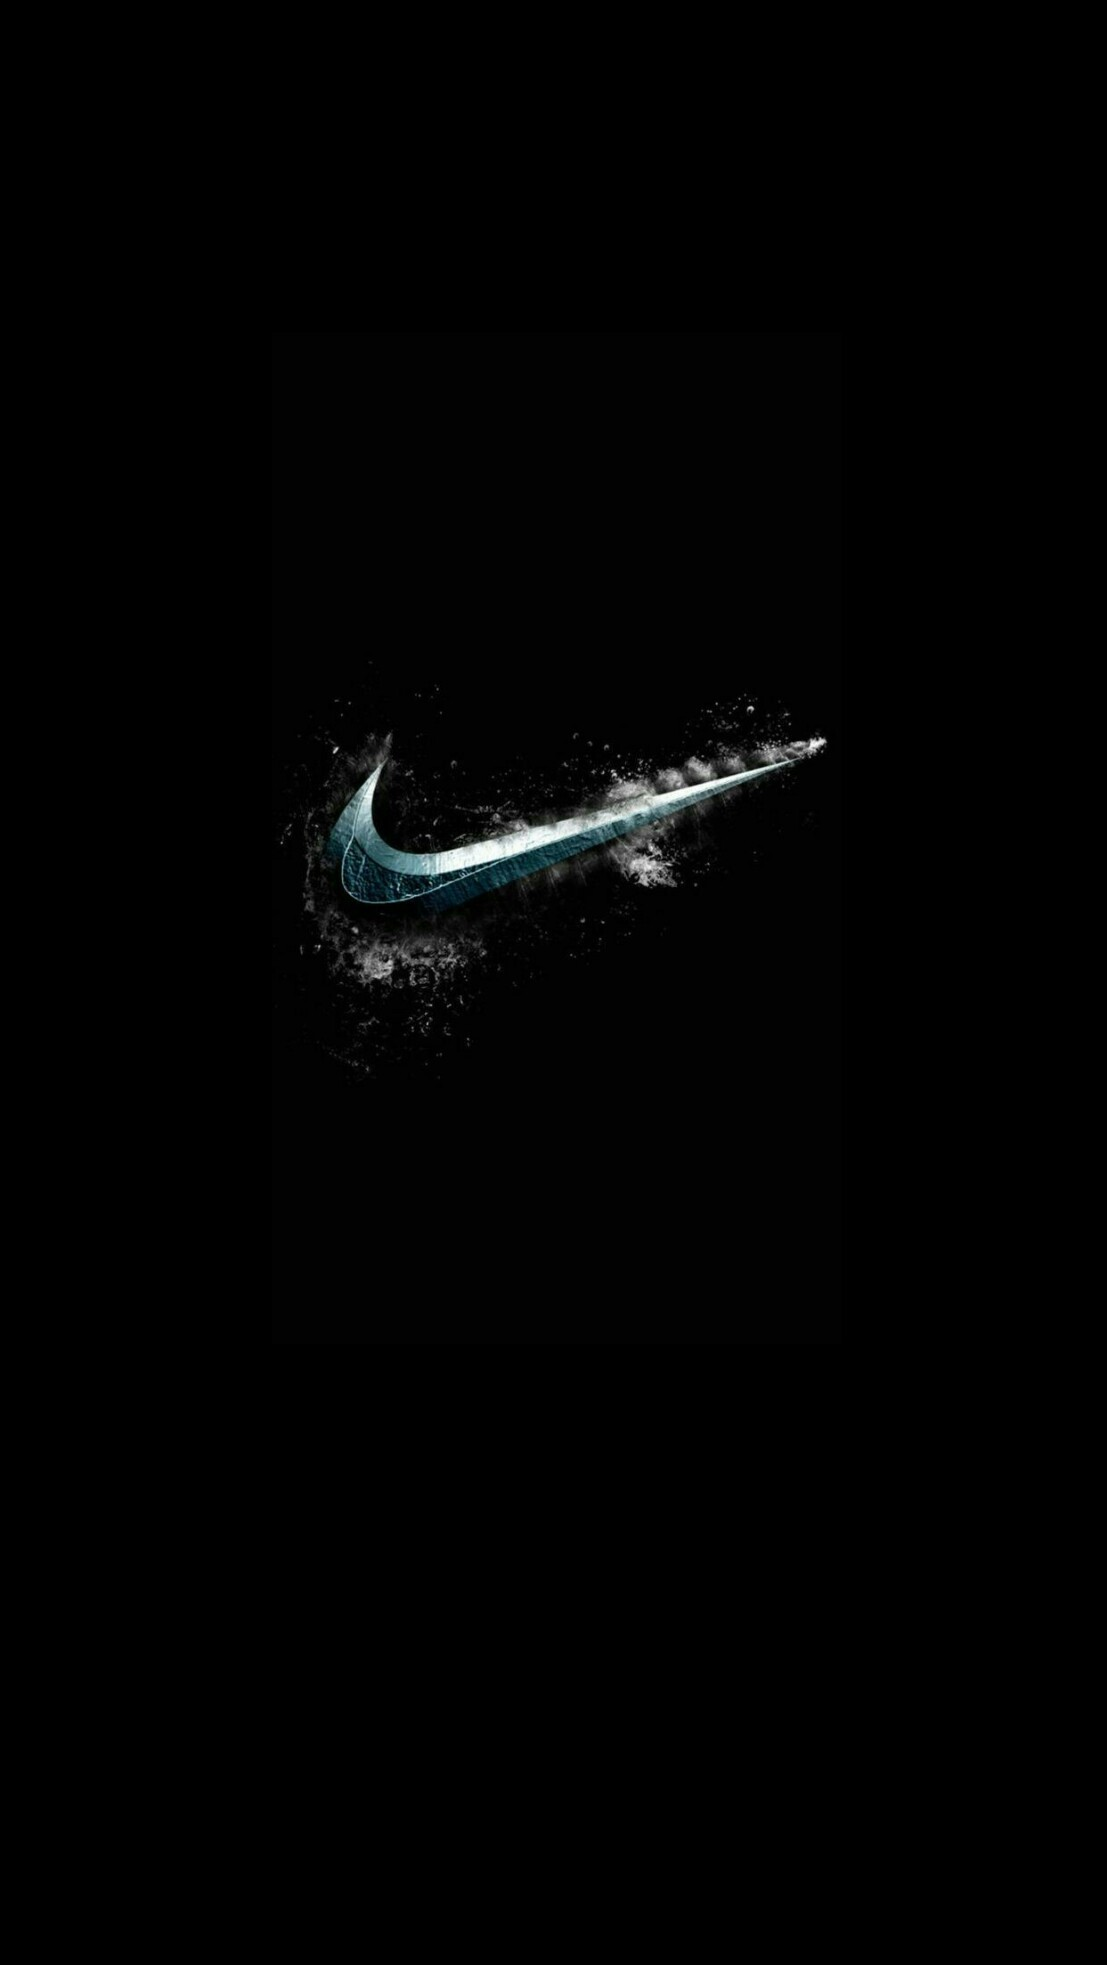 Nike Black Wallpaper 64 Images